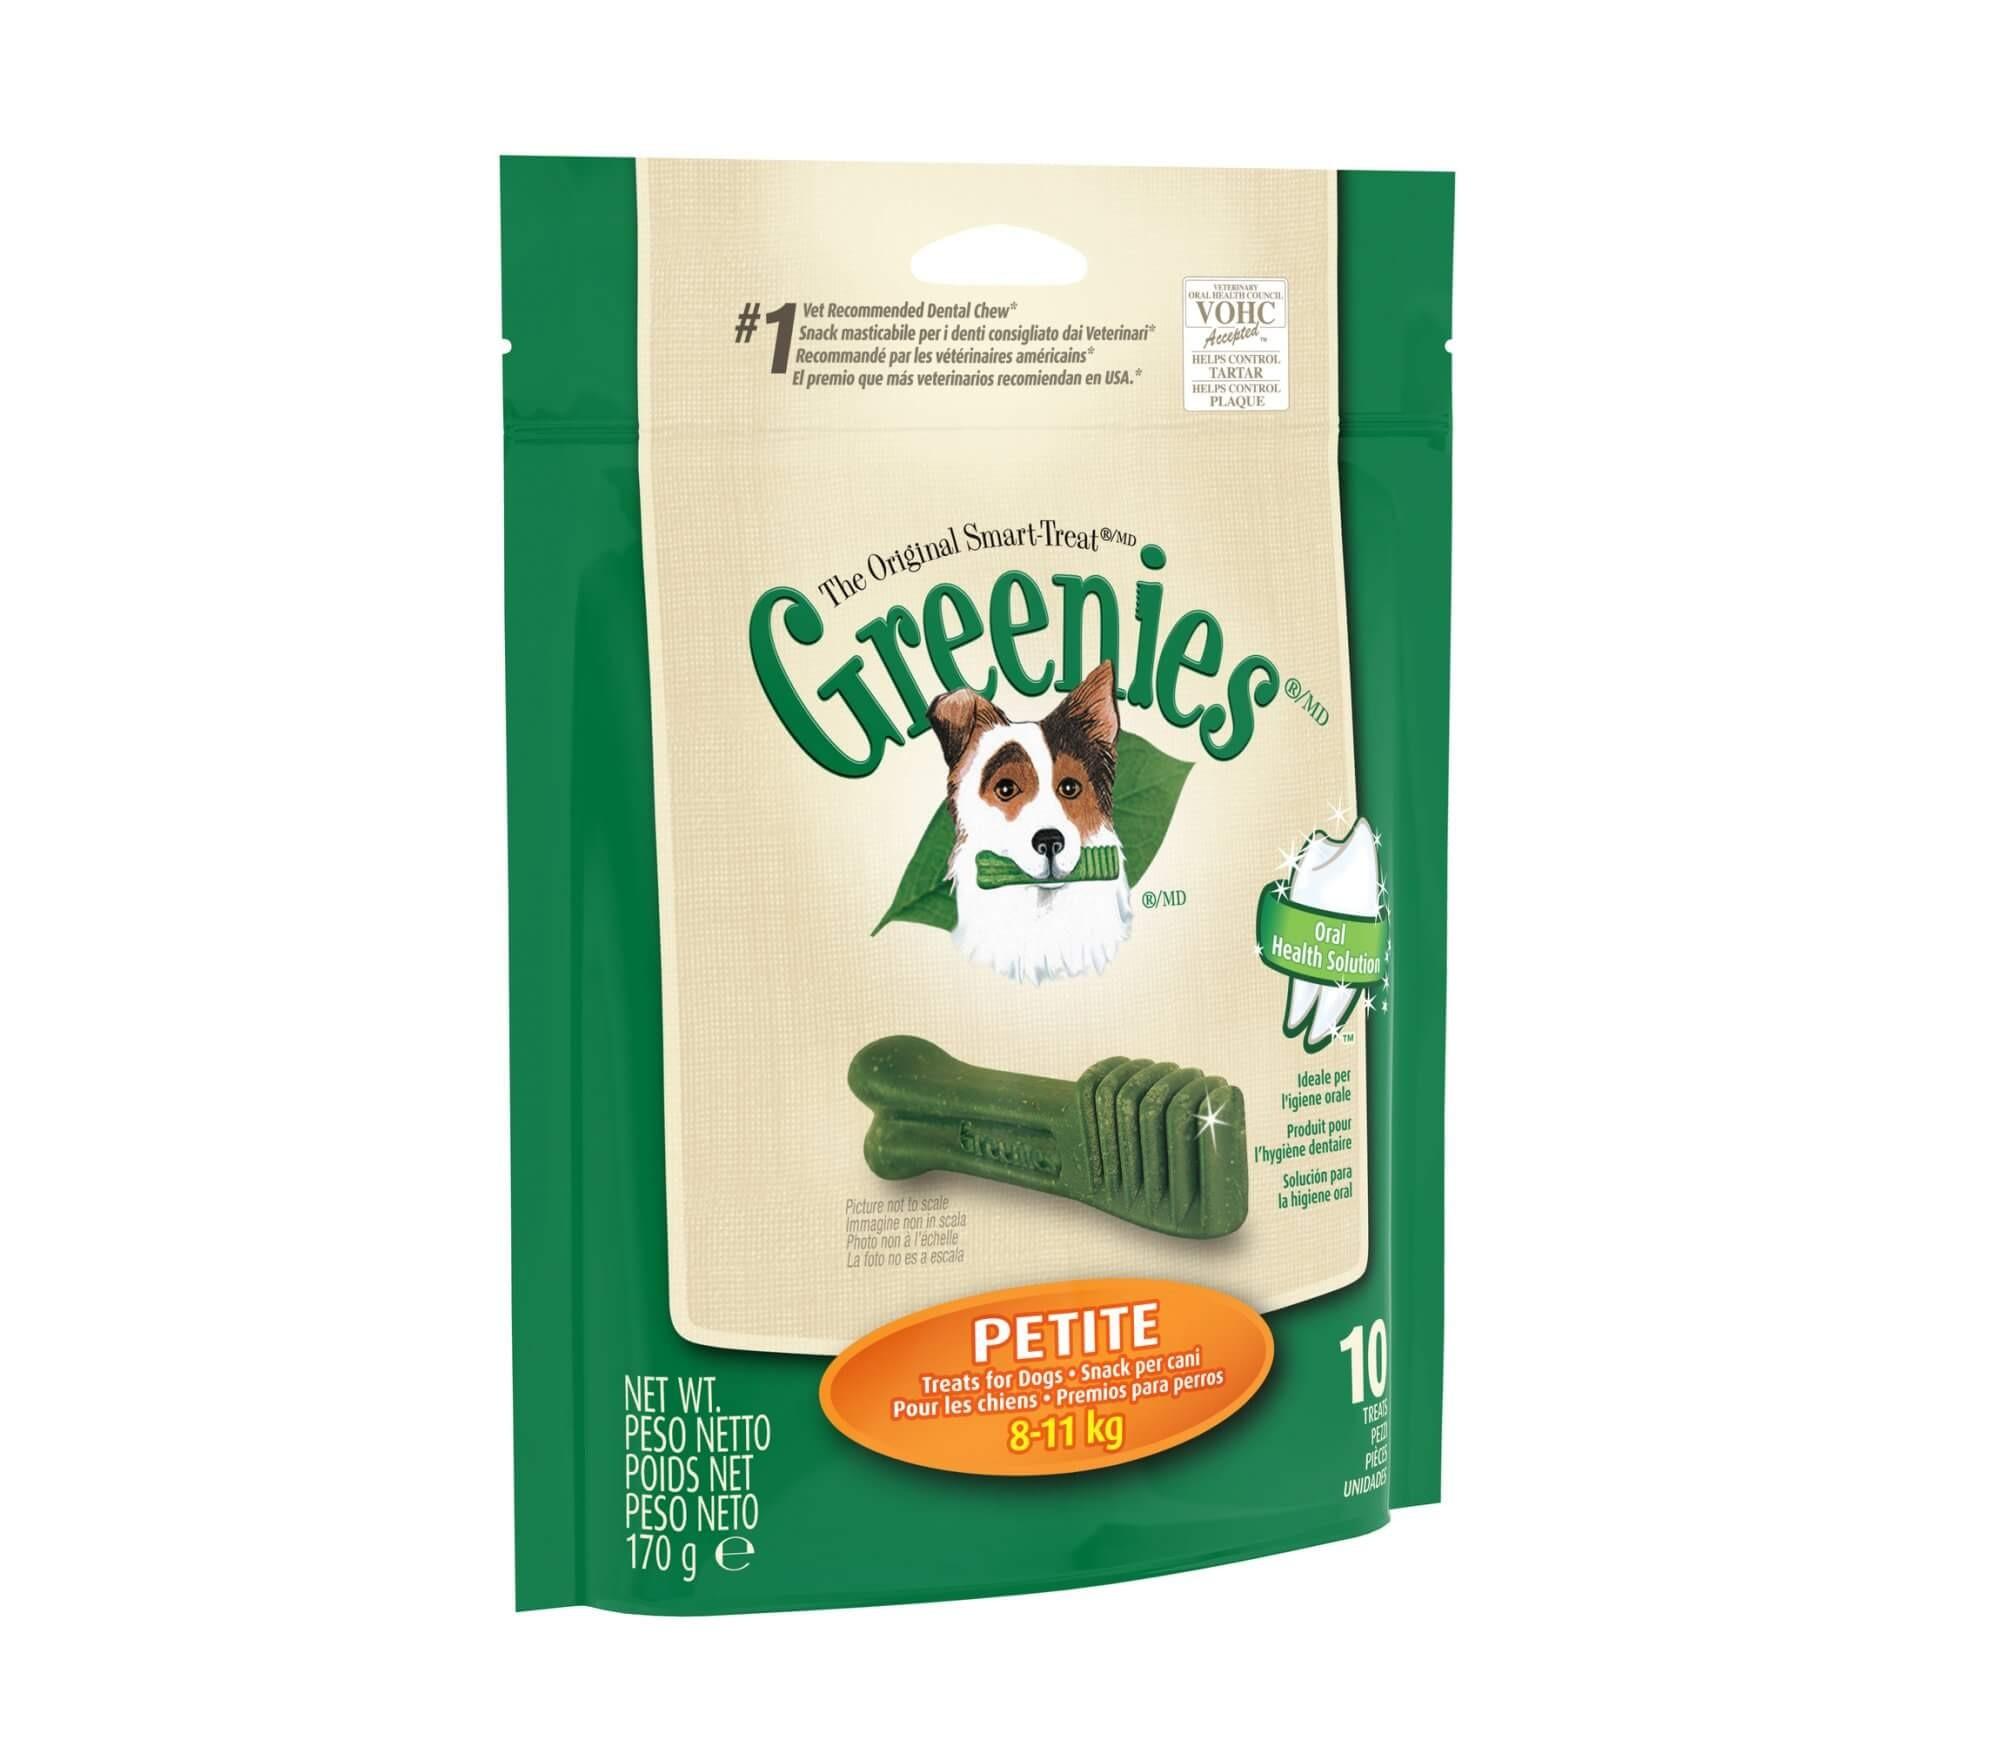 Greenies Petite 10 os